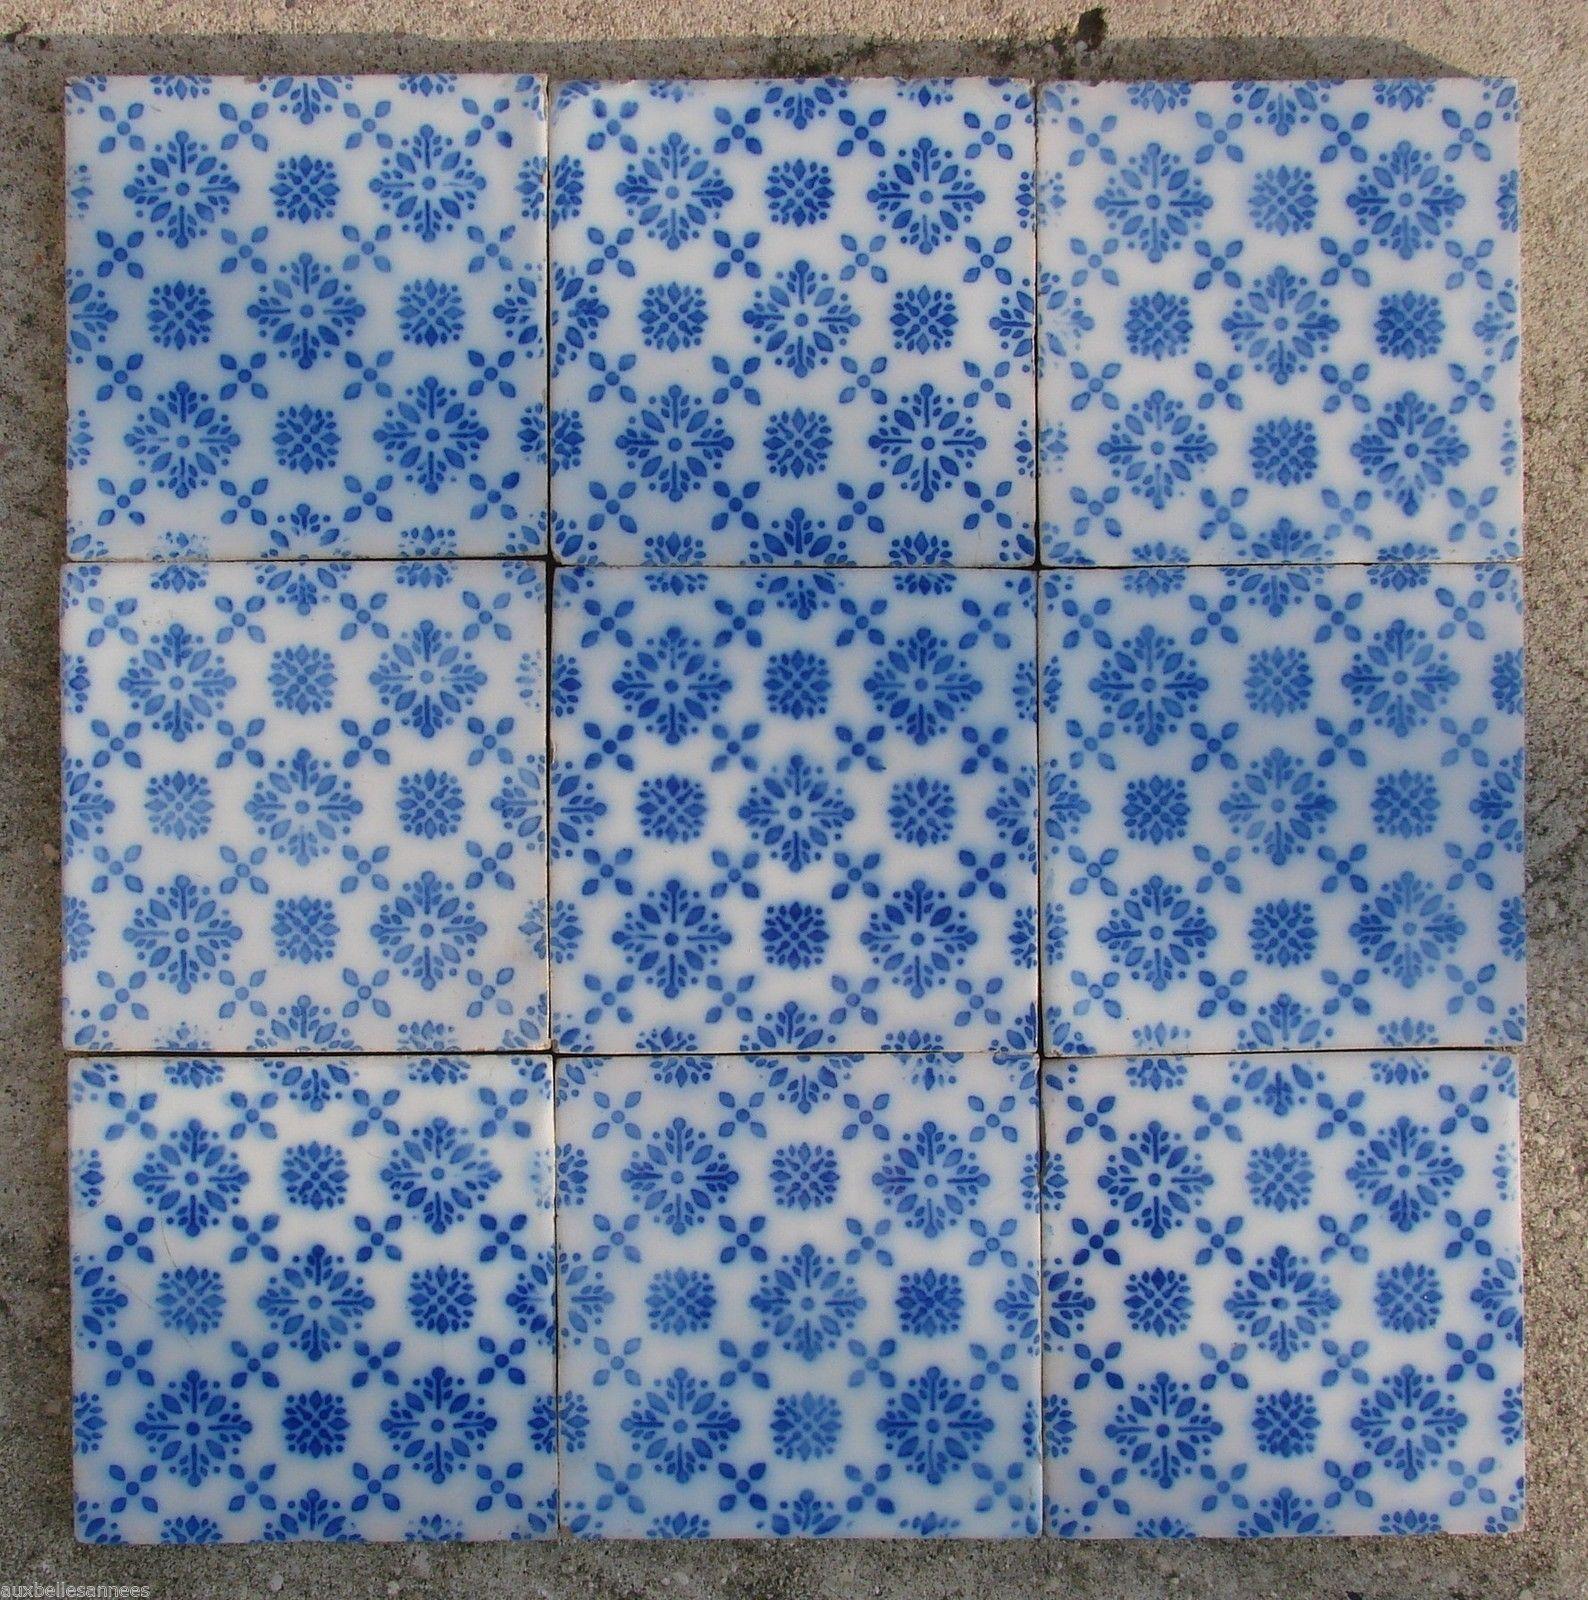 Ancien Carreau De Faience Terre Cuite Motif Bleu Carrelage